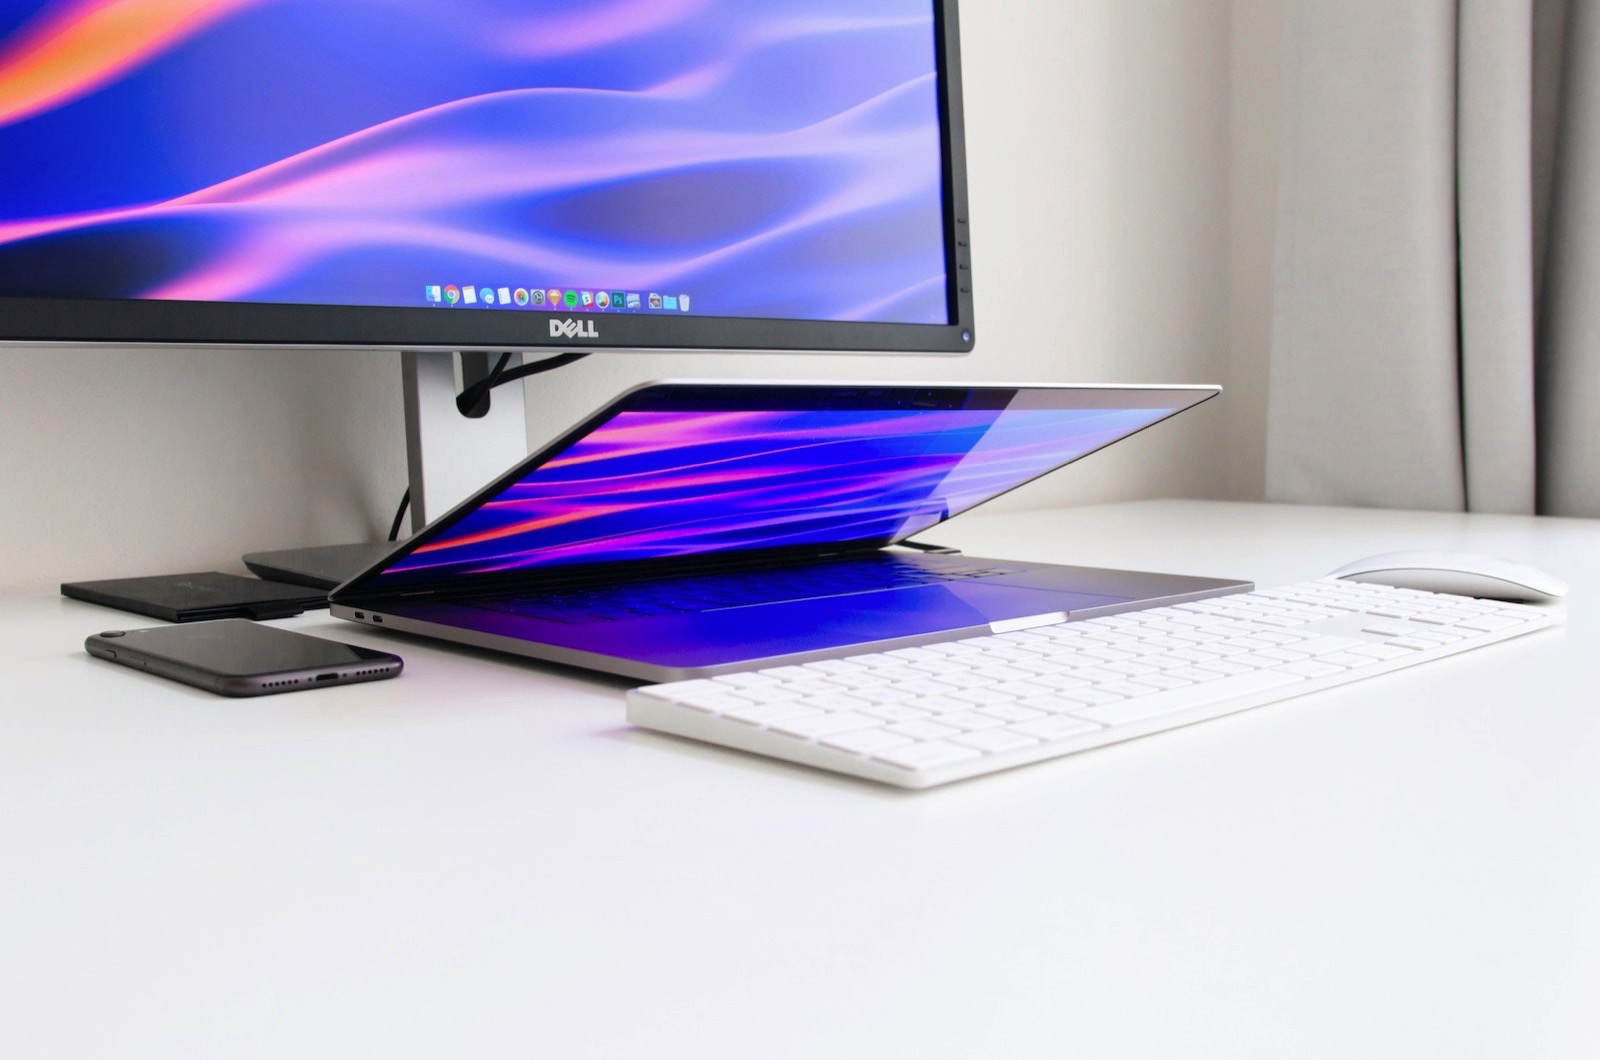 ales-nesetril-1070147-unsplash-using-macbookpro-with-monitor.jpg